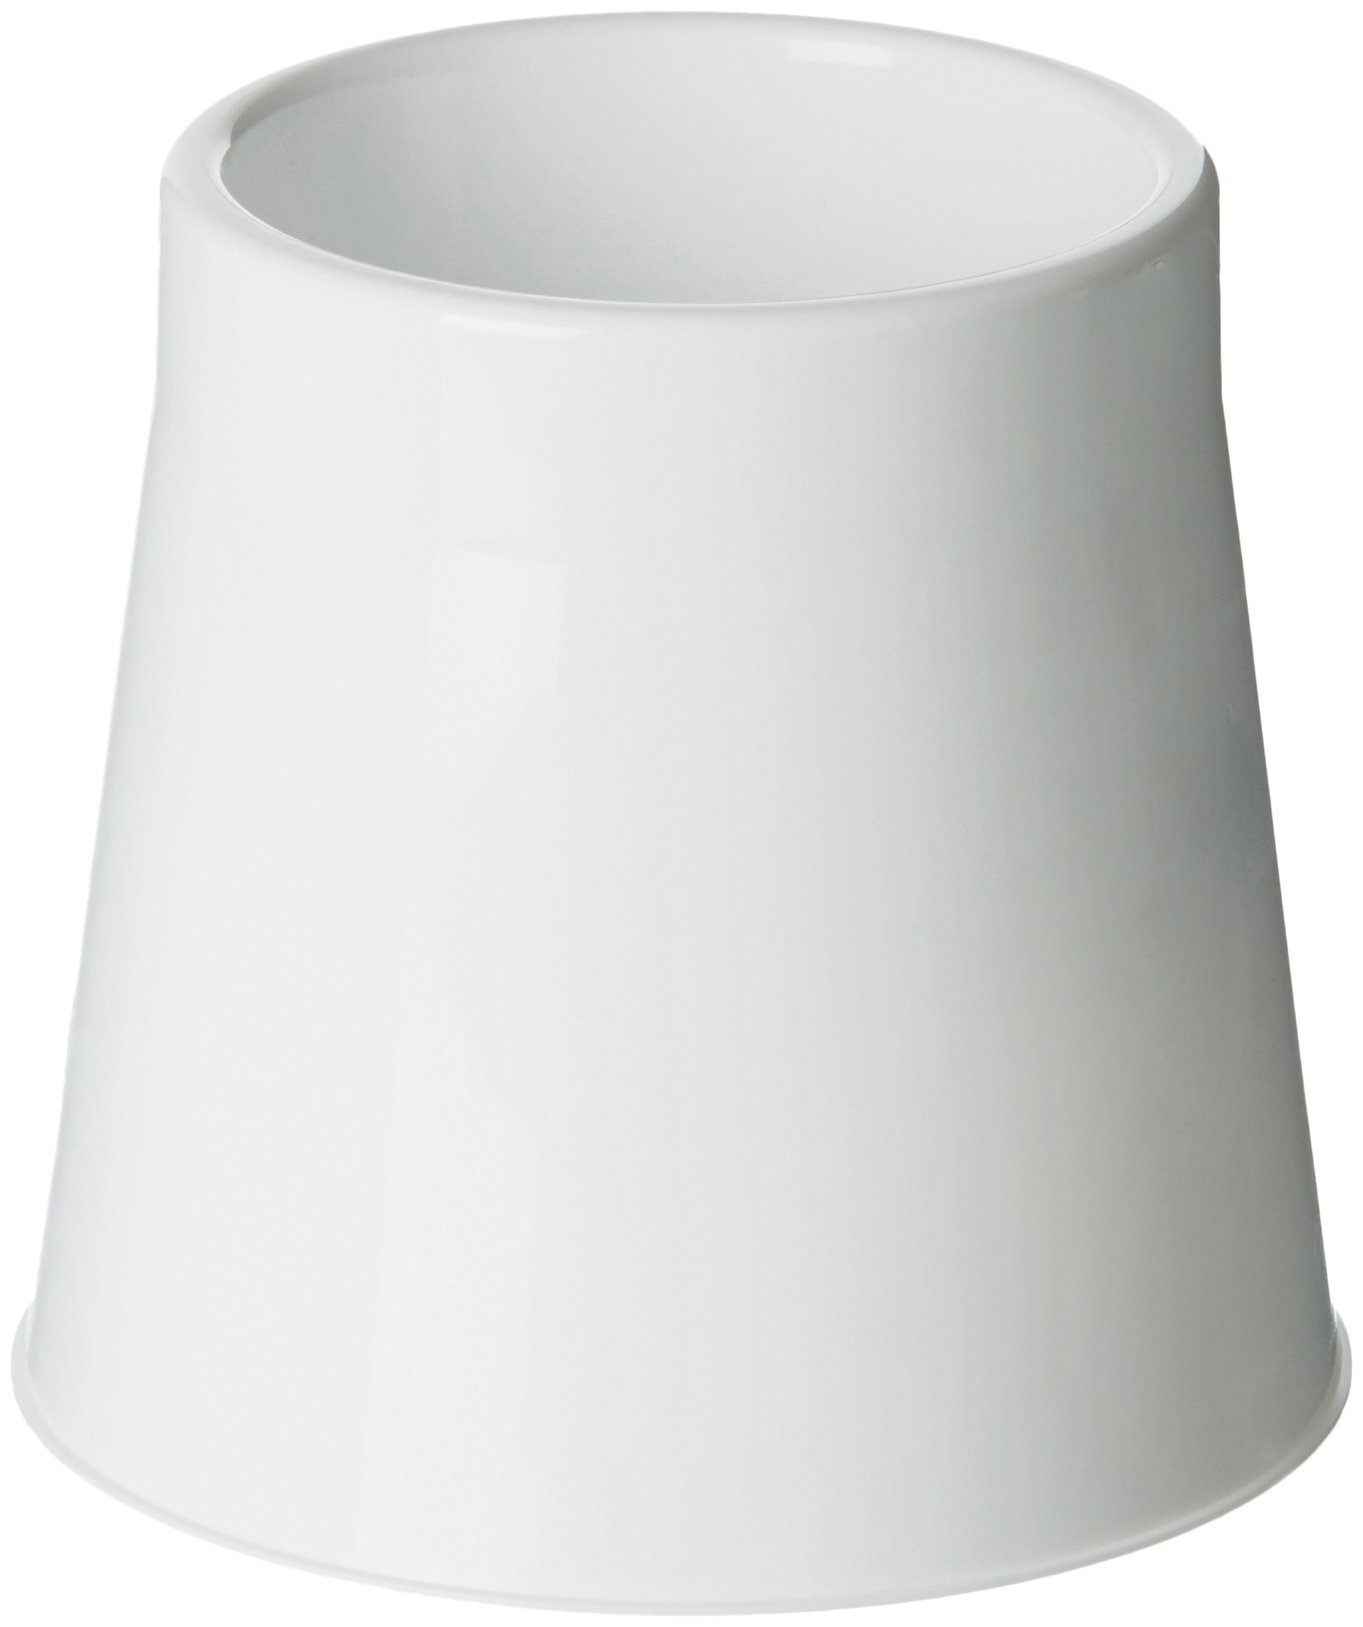 Amazon Basics Toilet Bowl Brush Holder, White, 12-Pack